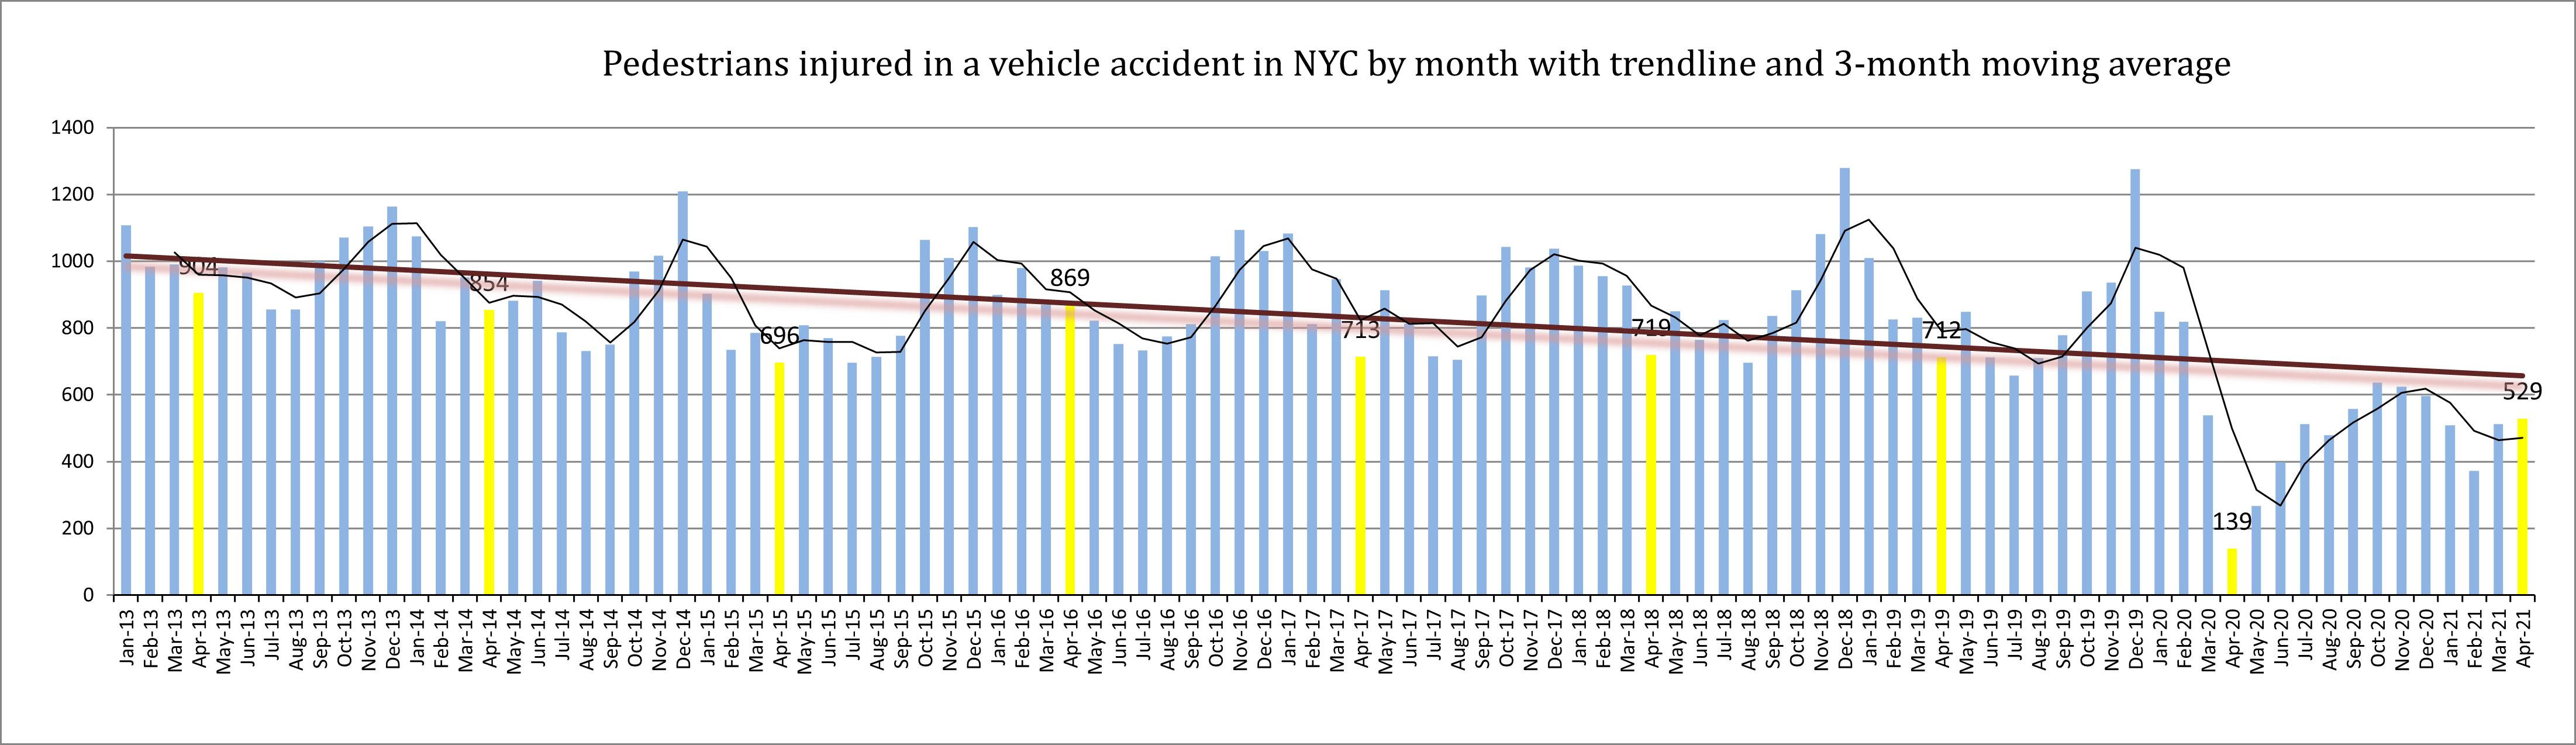 pedestrian injuries NYC April 2021